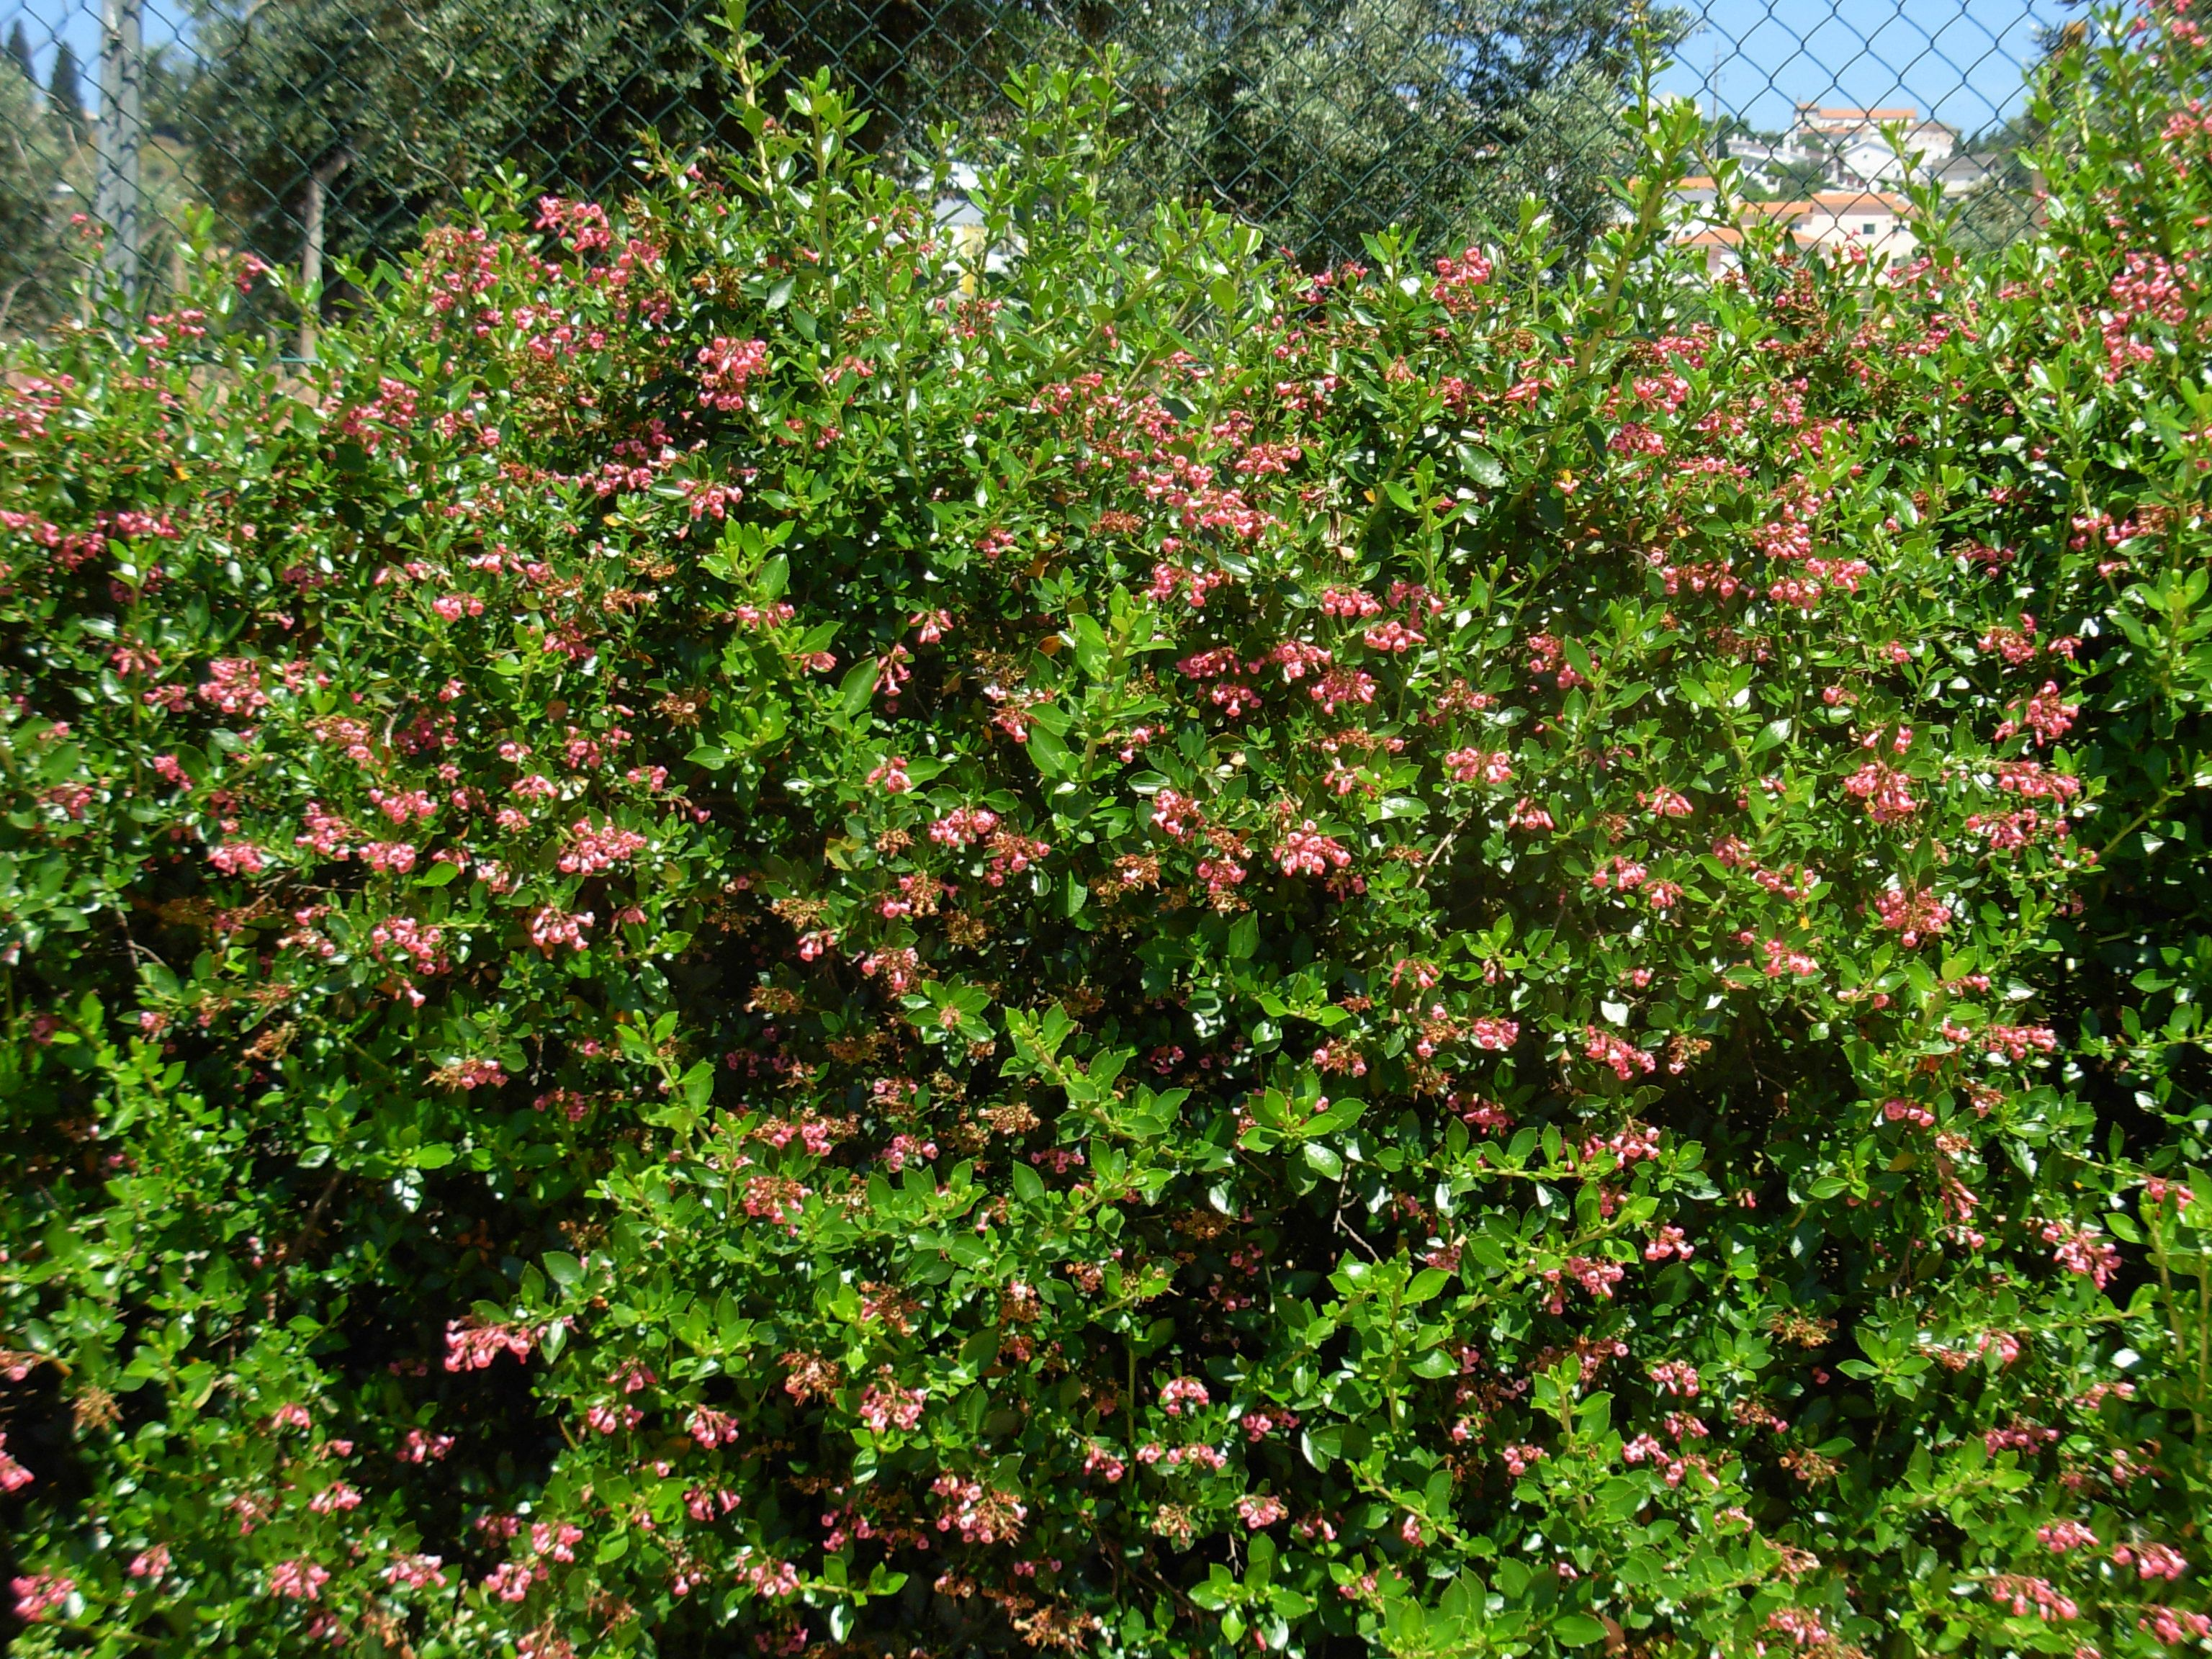 Escallonia rubra newport dwarf prefers hot sun and well